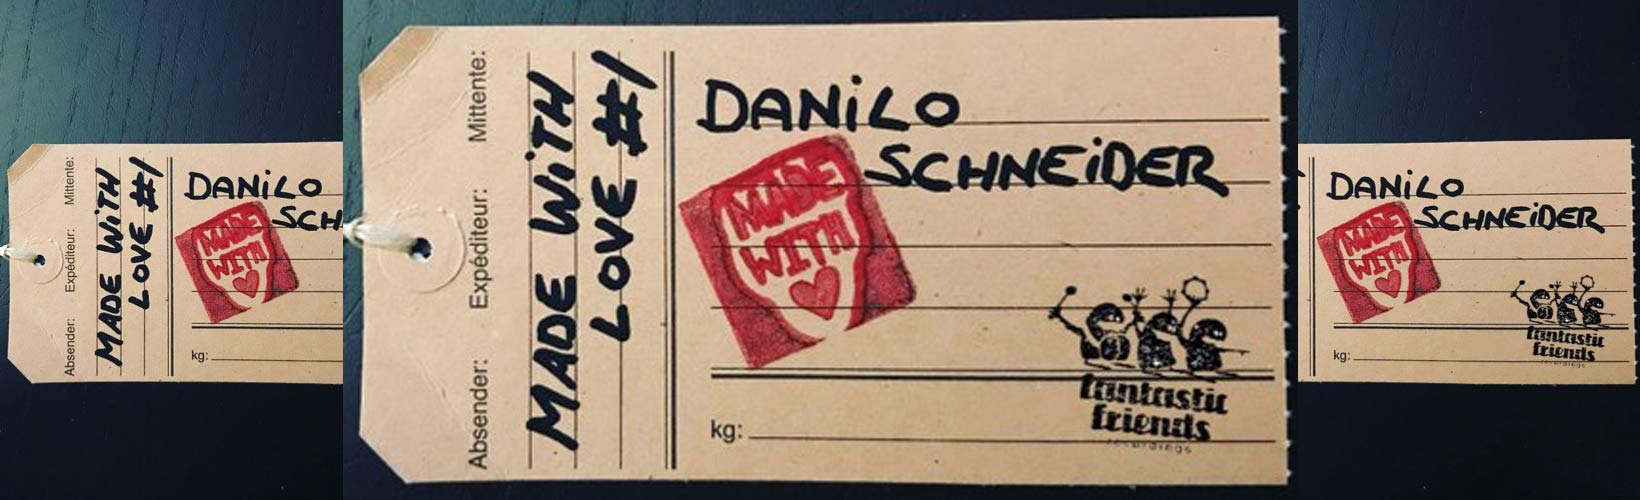 Danilo Schneider – made with love #1 Podcast